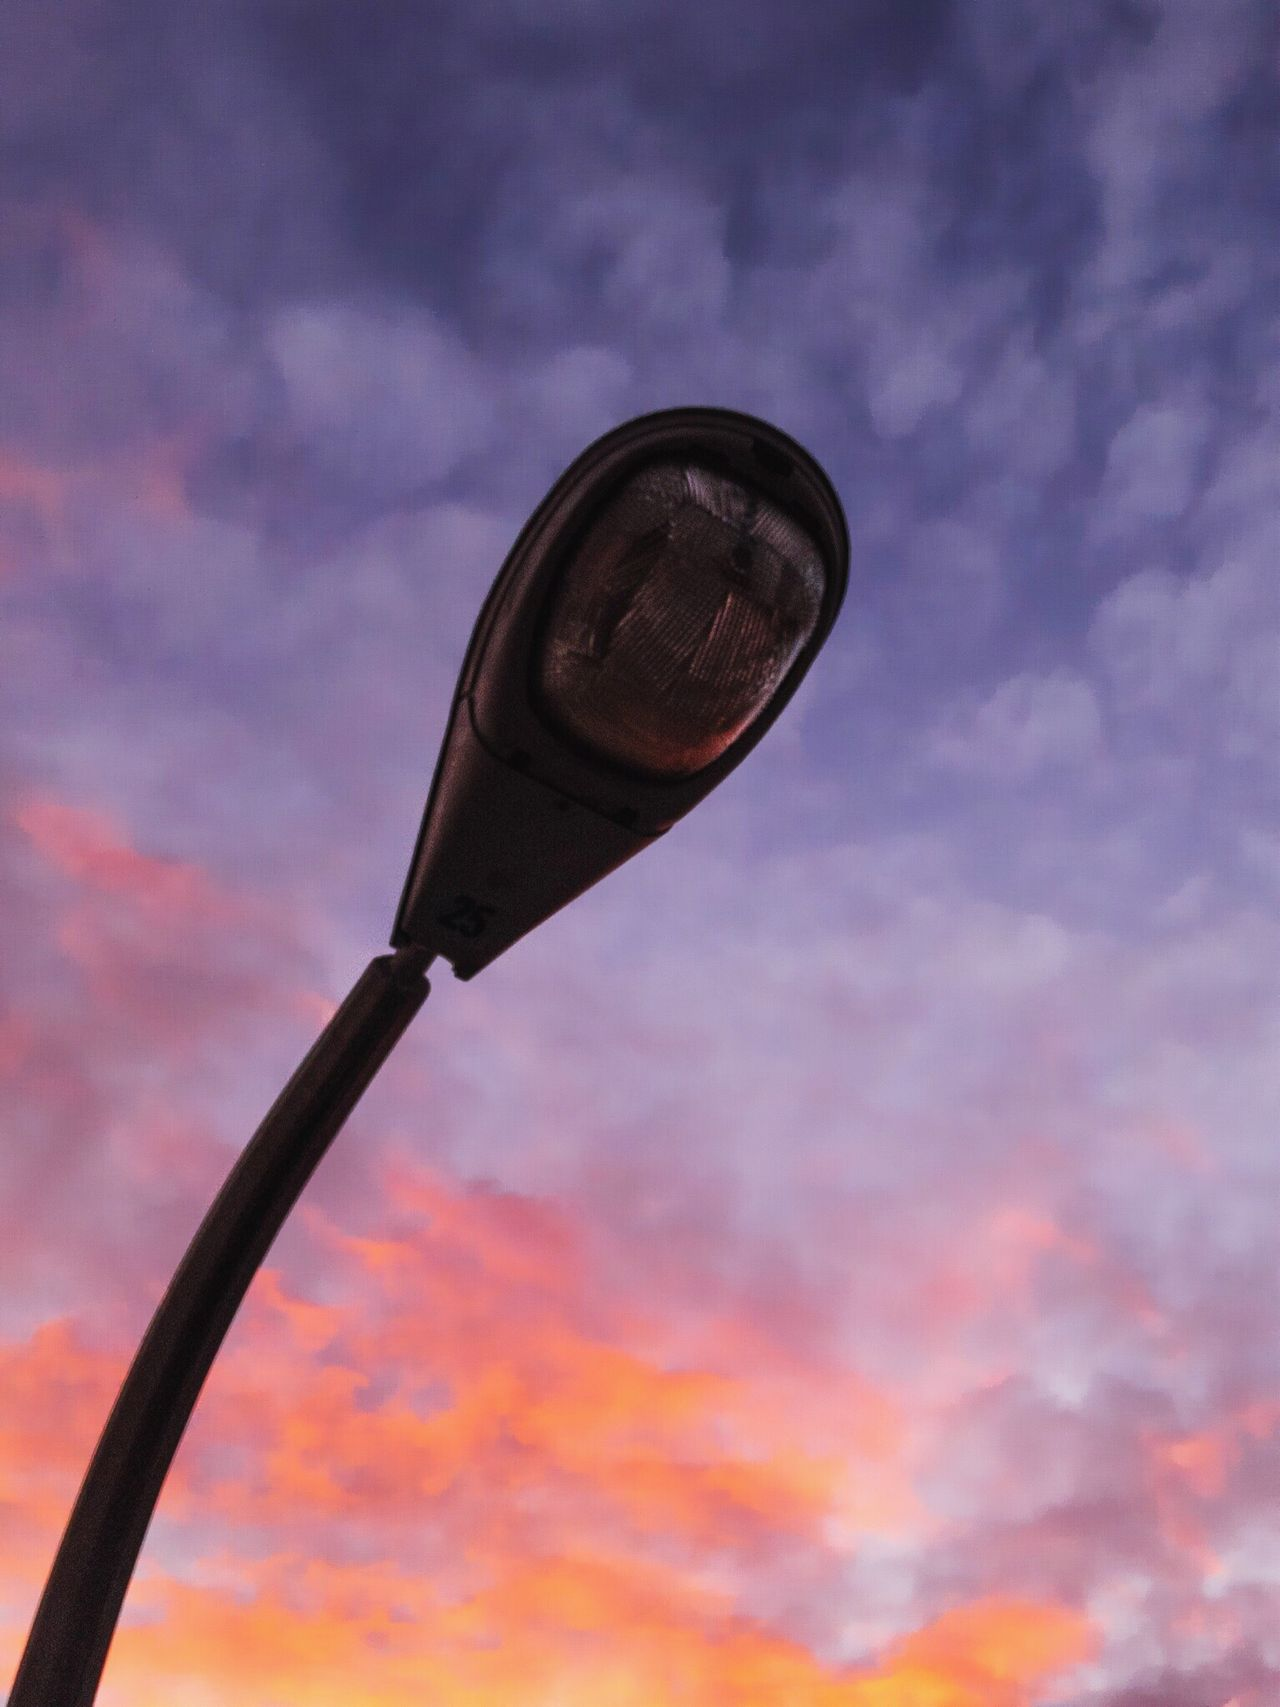 Sky Low Angle View Outdoors Sunrise Sunset Streetlight Streetlamp